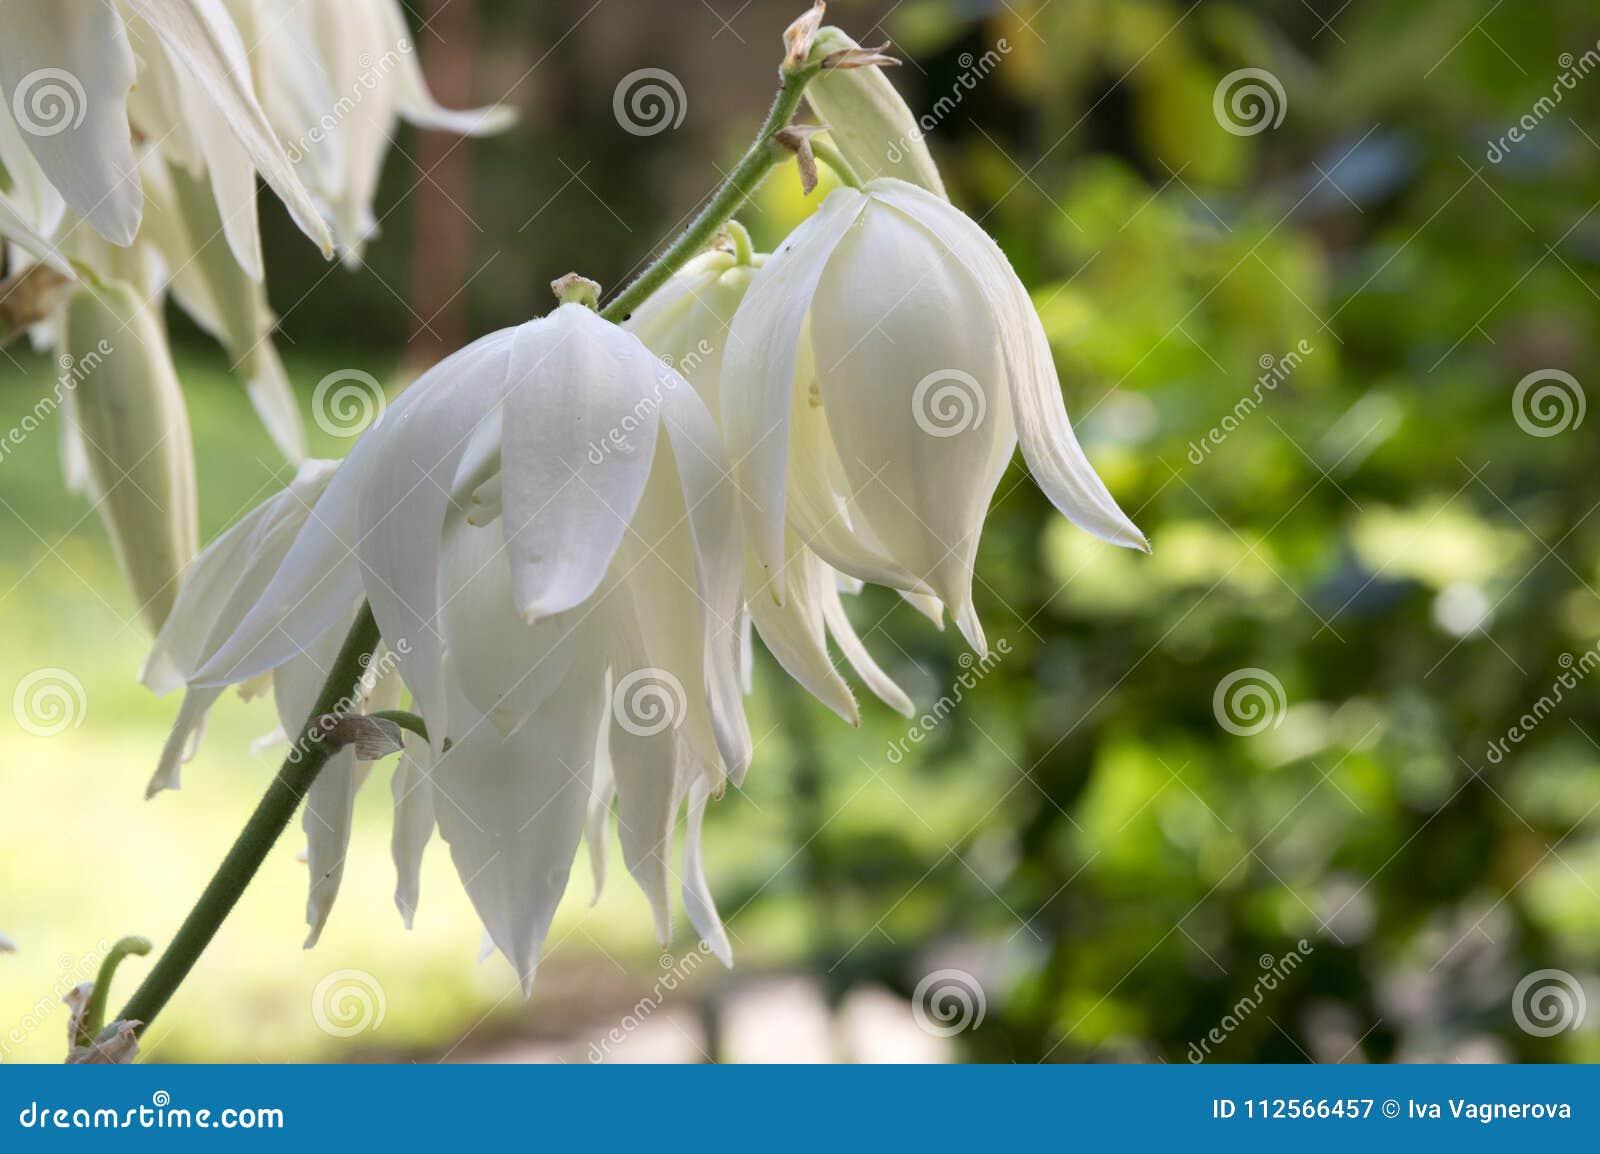 Yucca Filamentosa Amazing Plant With White Flowers Stock Image